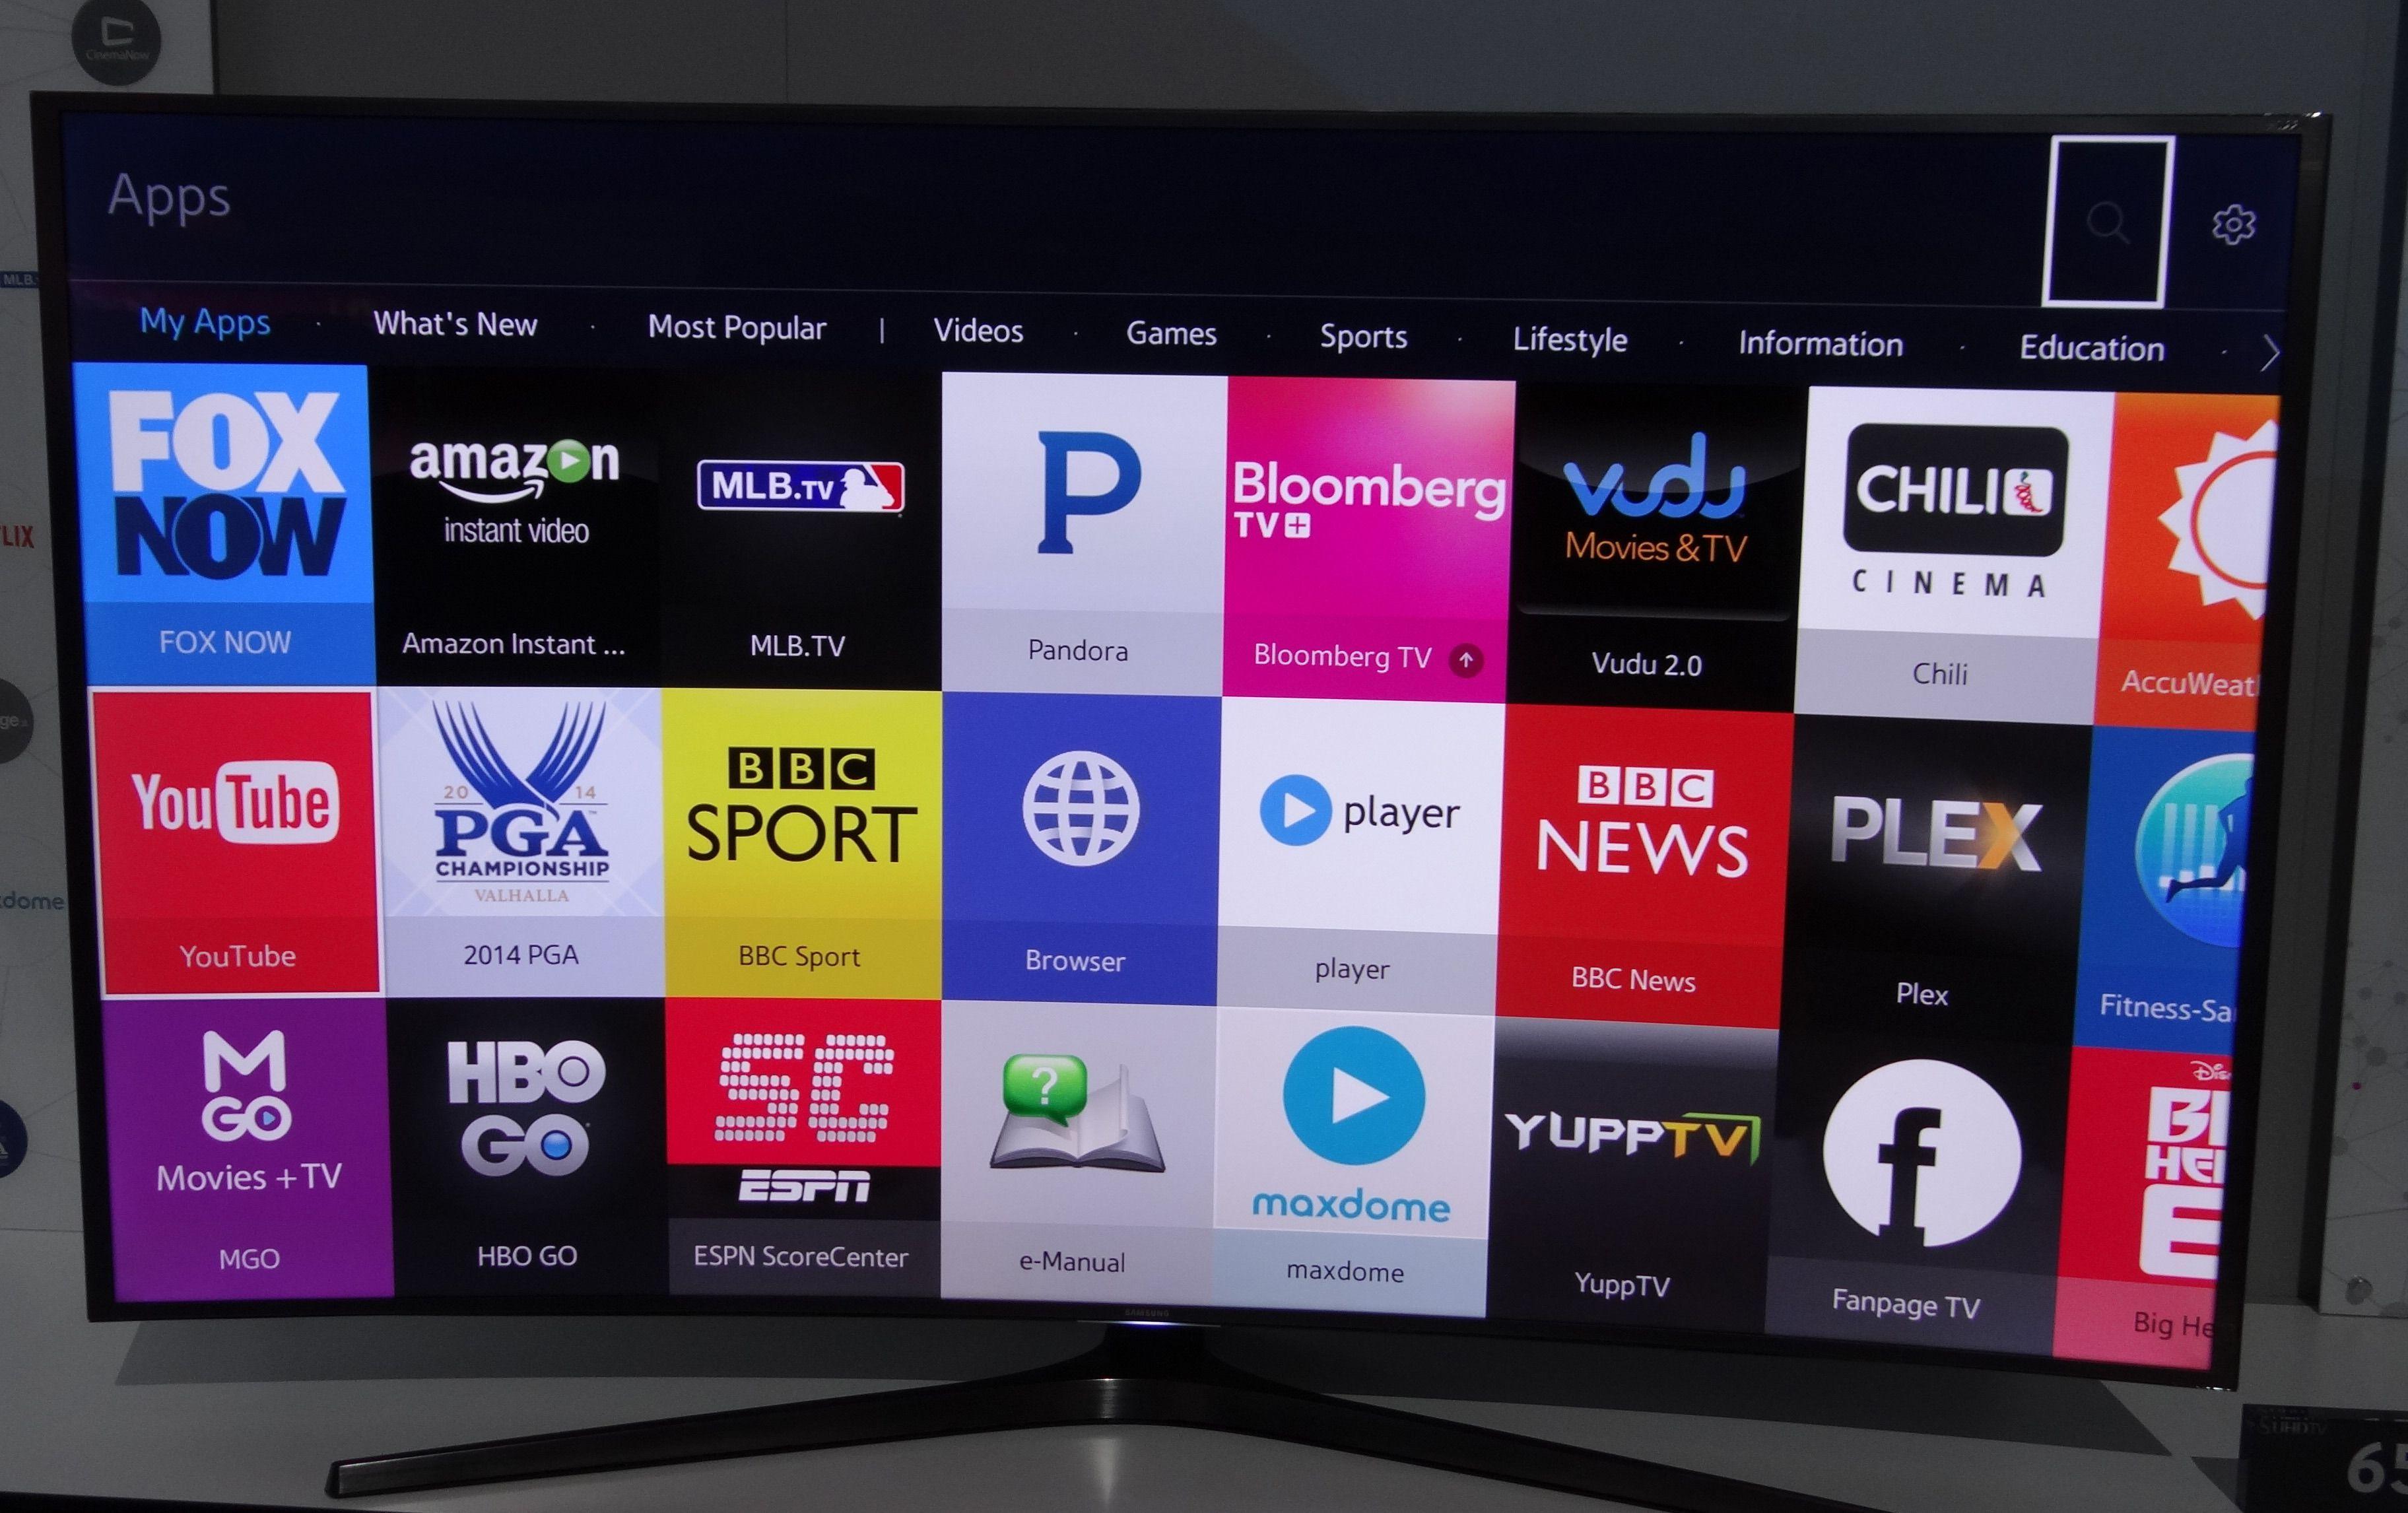 Samsung Tizen TV | TV UI | Instant video, Video games, Movie tv